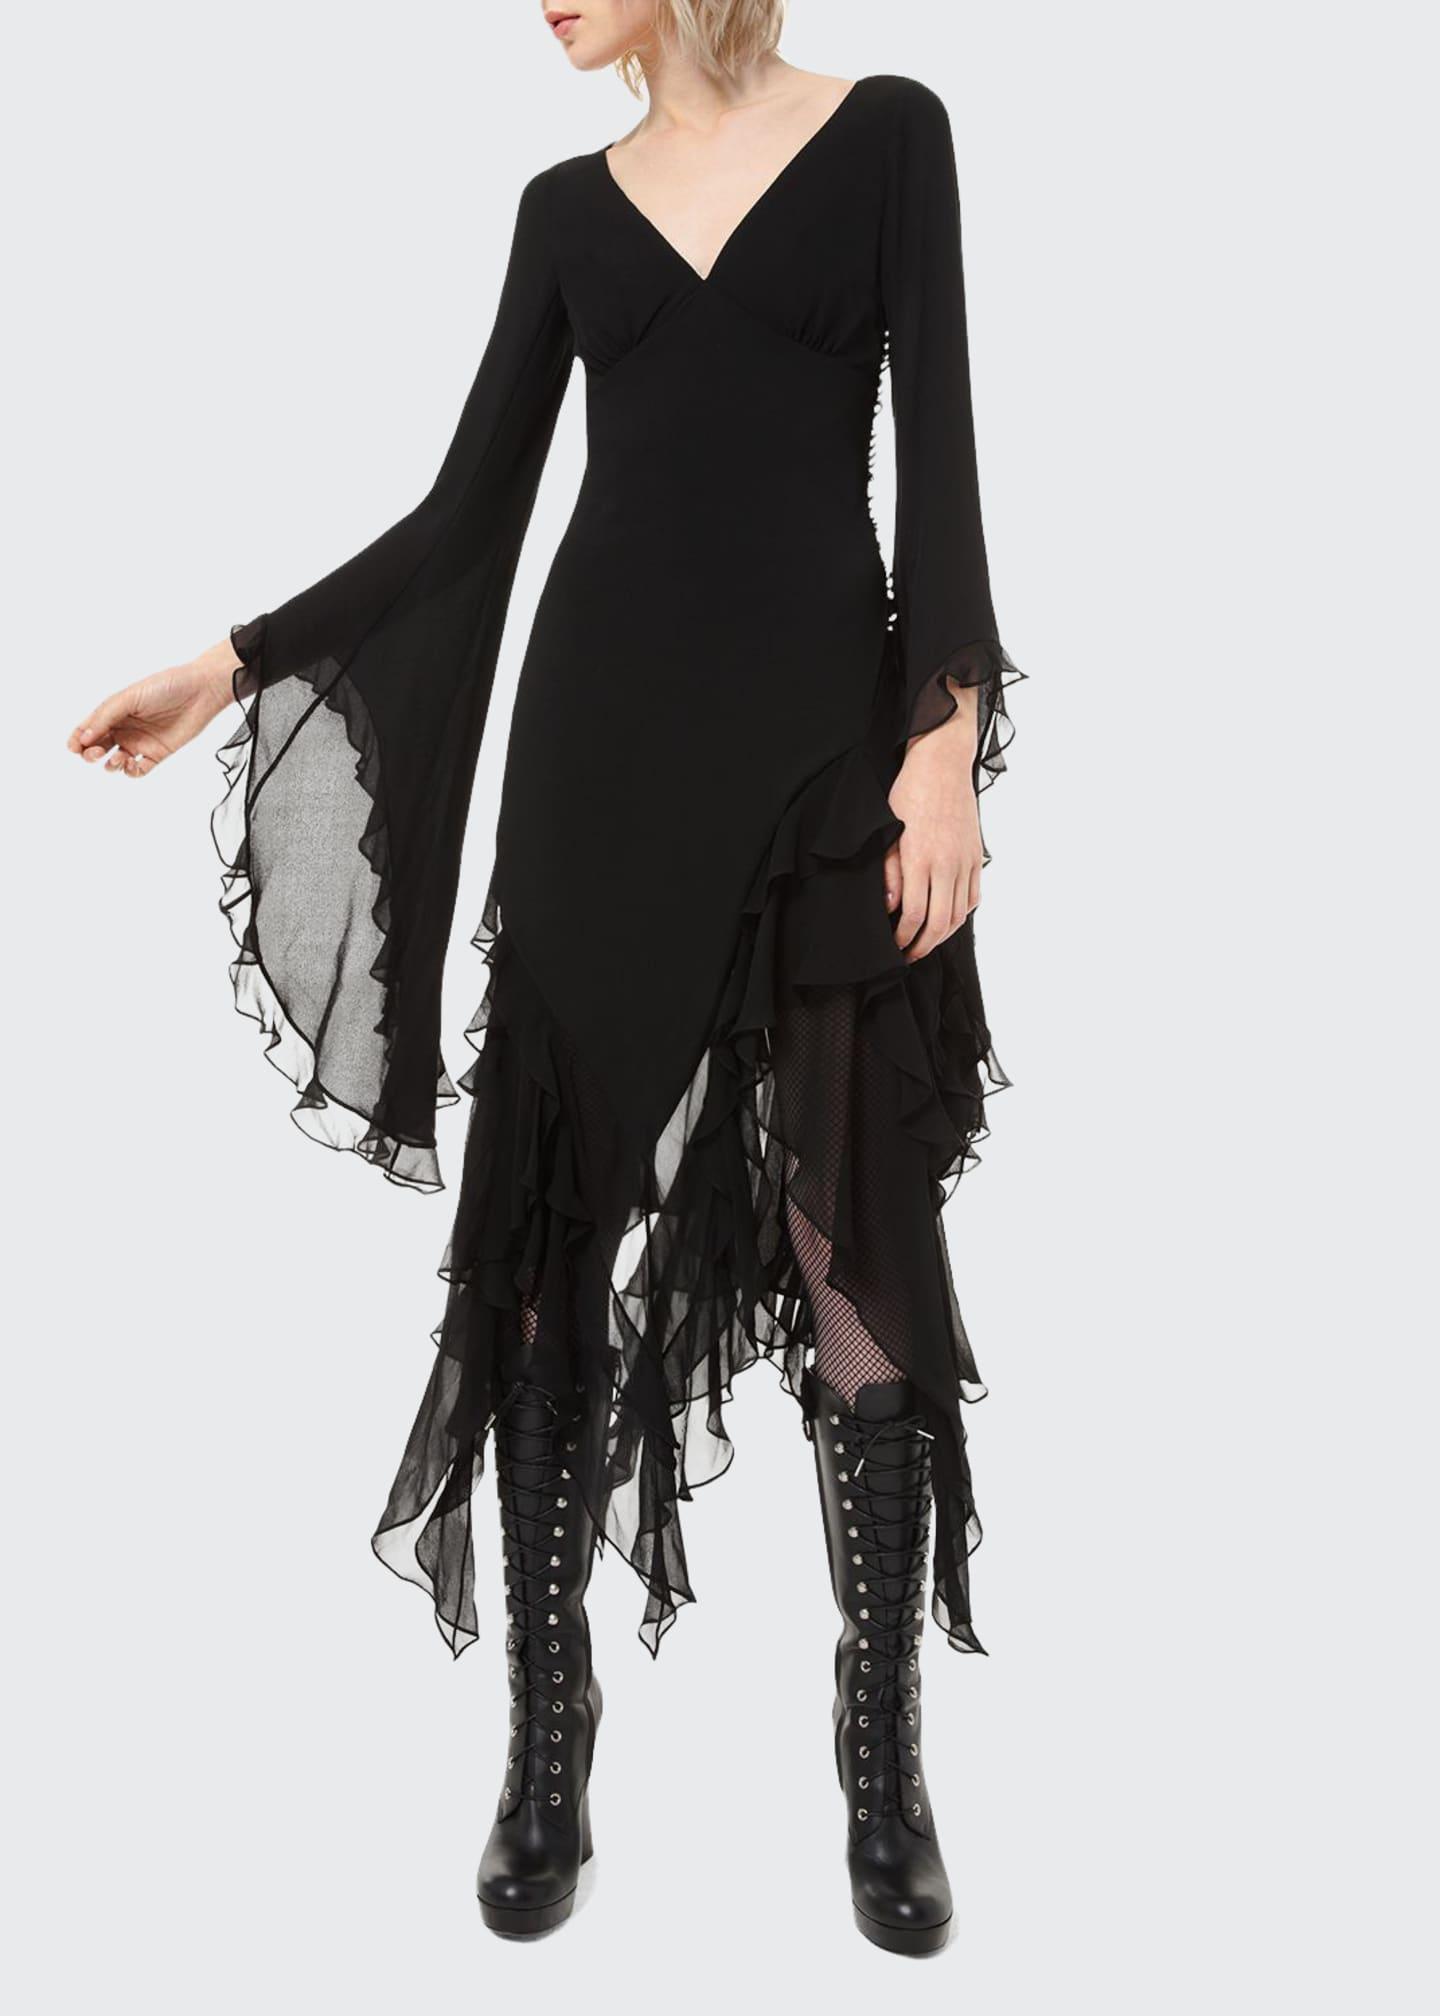 Michael Kors Collection Ruffled Chiffon Bias Midi Dress